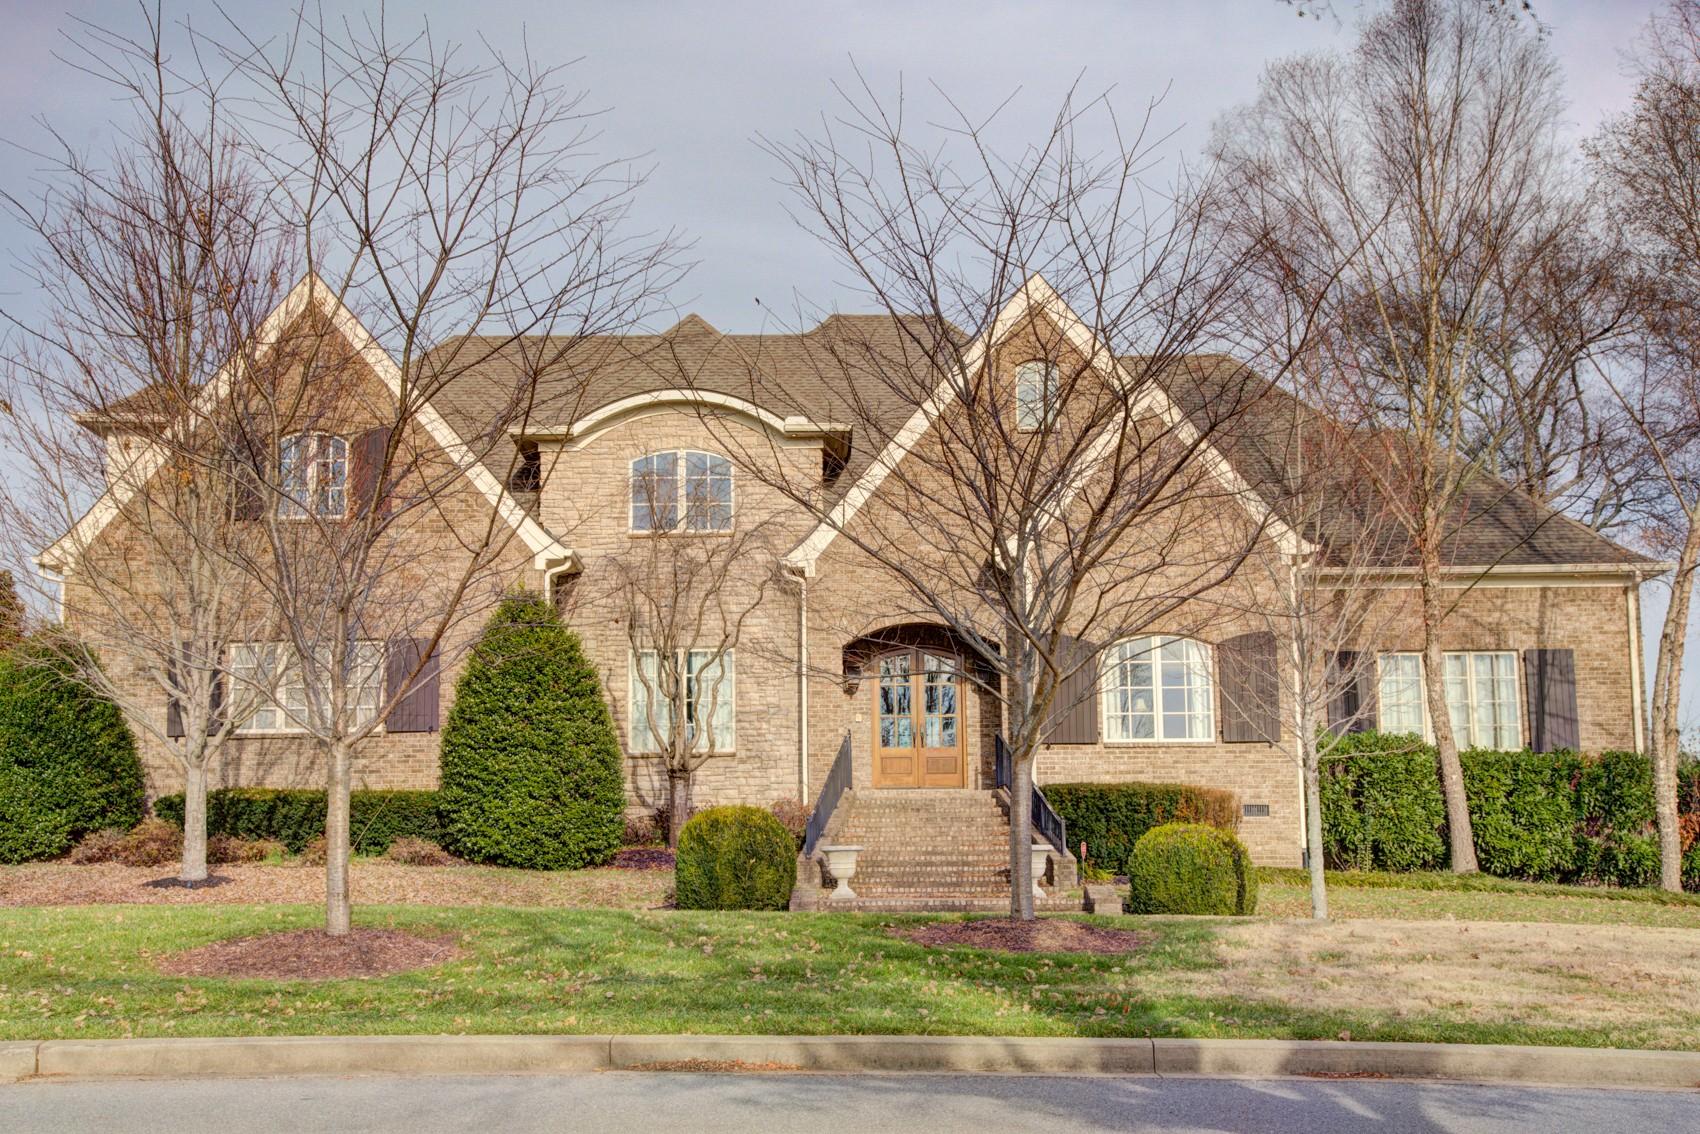 1090 Plantation Blvd, Gallatin, TN 37066 - Gallatin, TN real estate listing